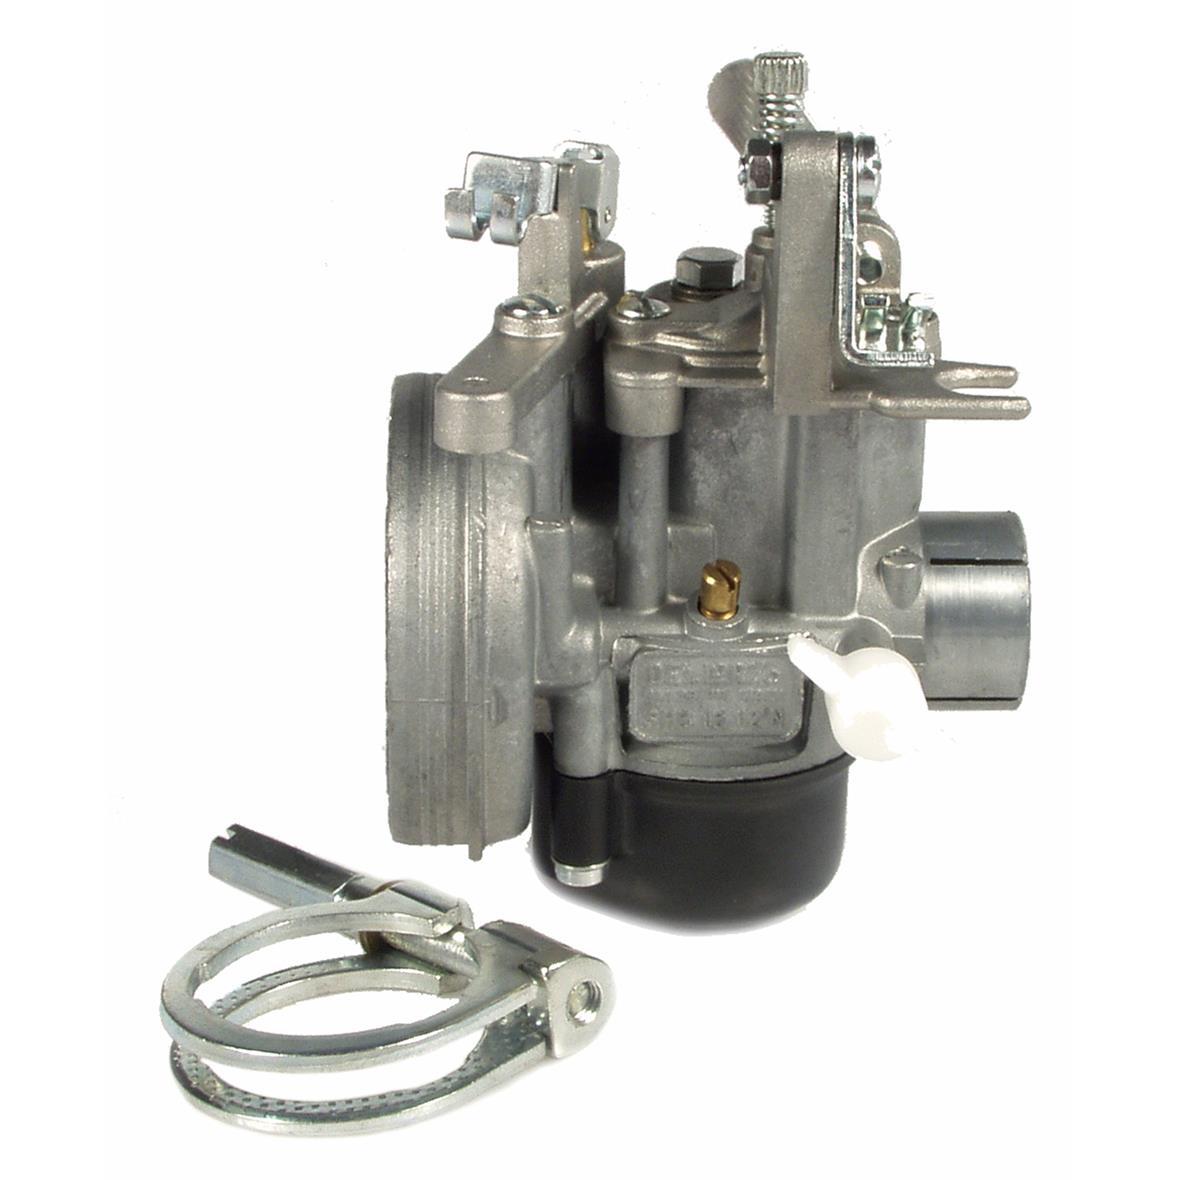 Product Image for 'Carburettor DELL'ORTO SHB 16.12NTitle'